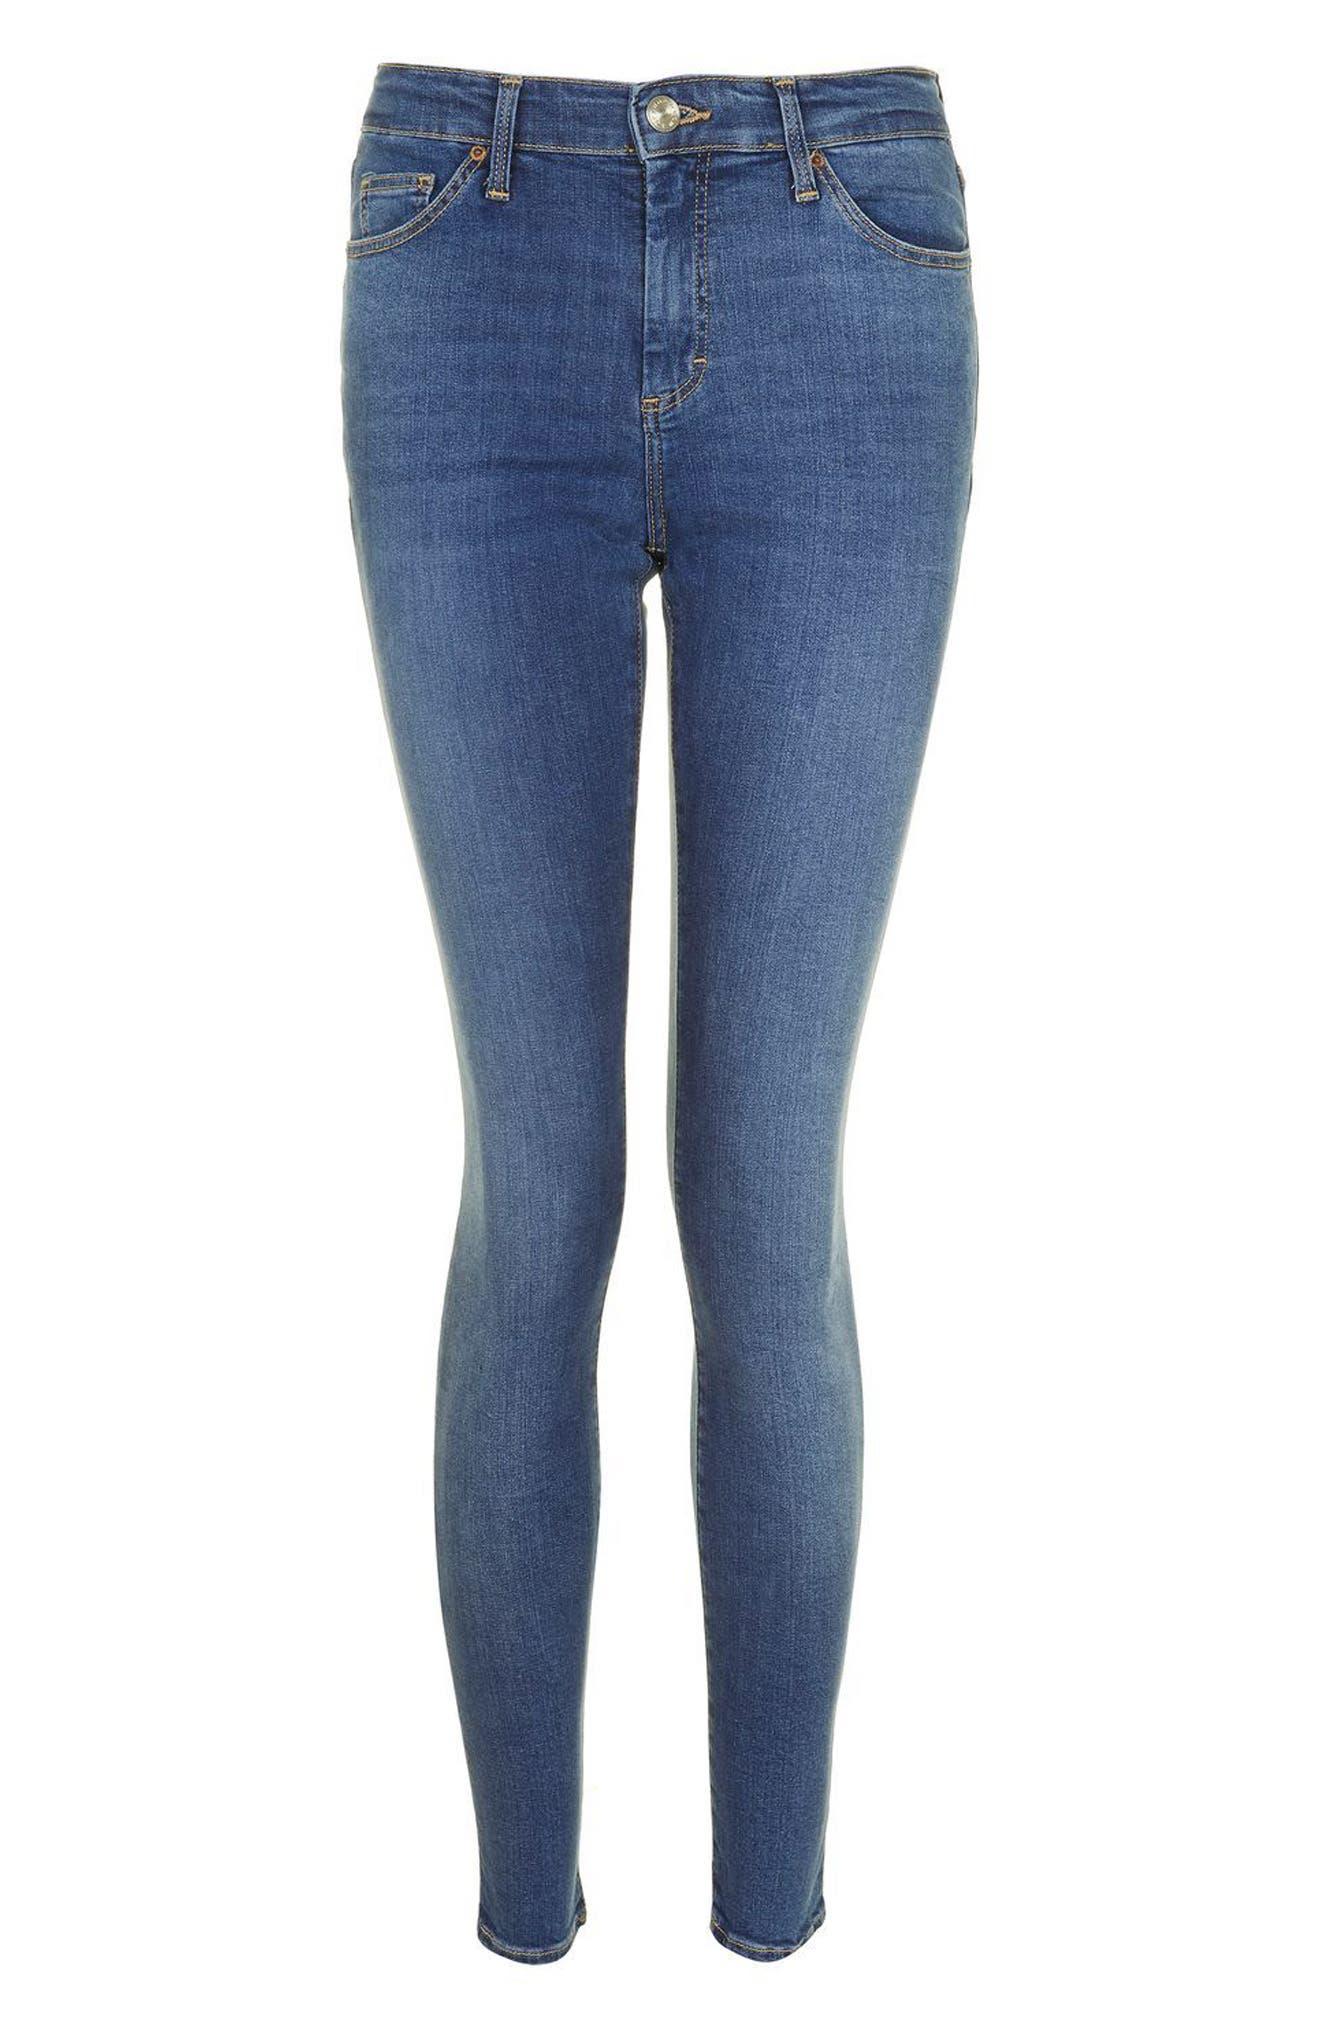 Sidney Skinny Ankle Jeans,                             Alternate thumbnail 3, color,                             400